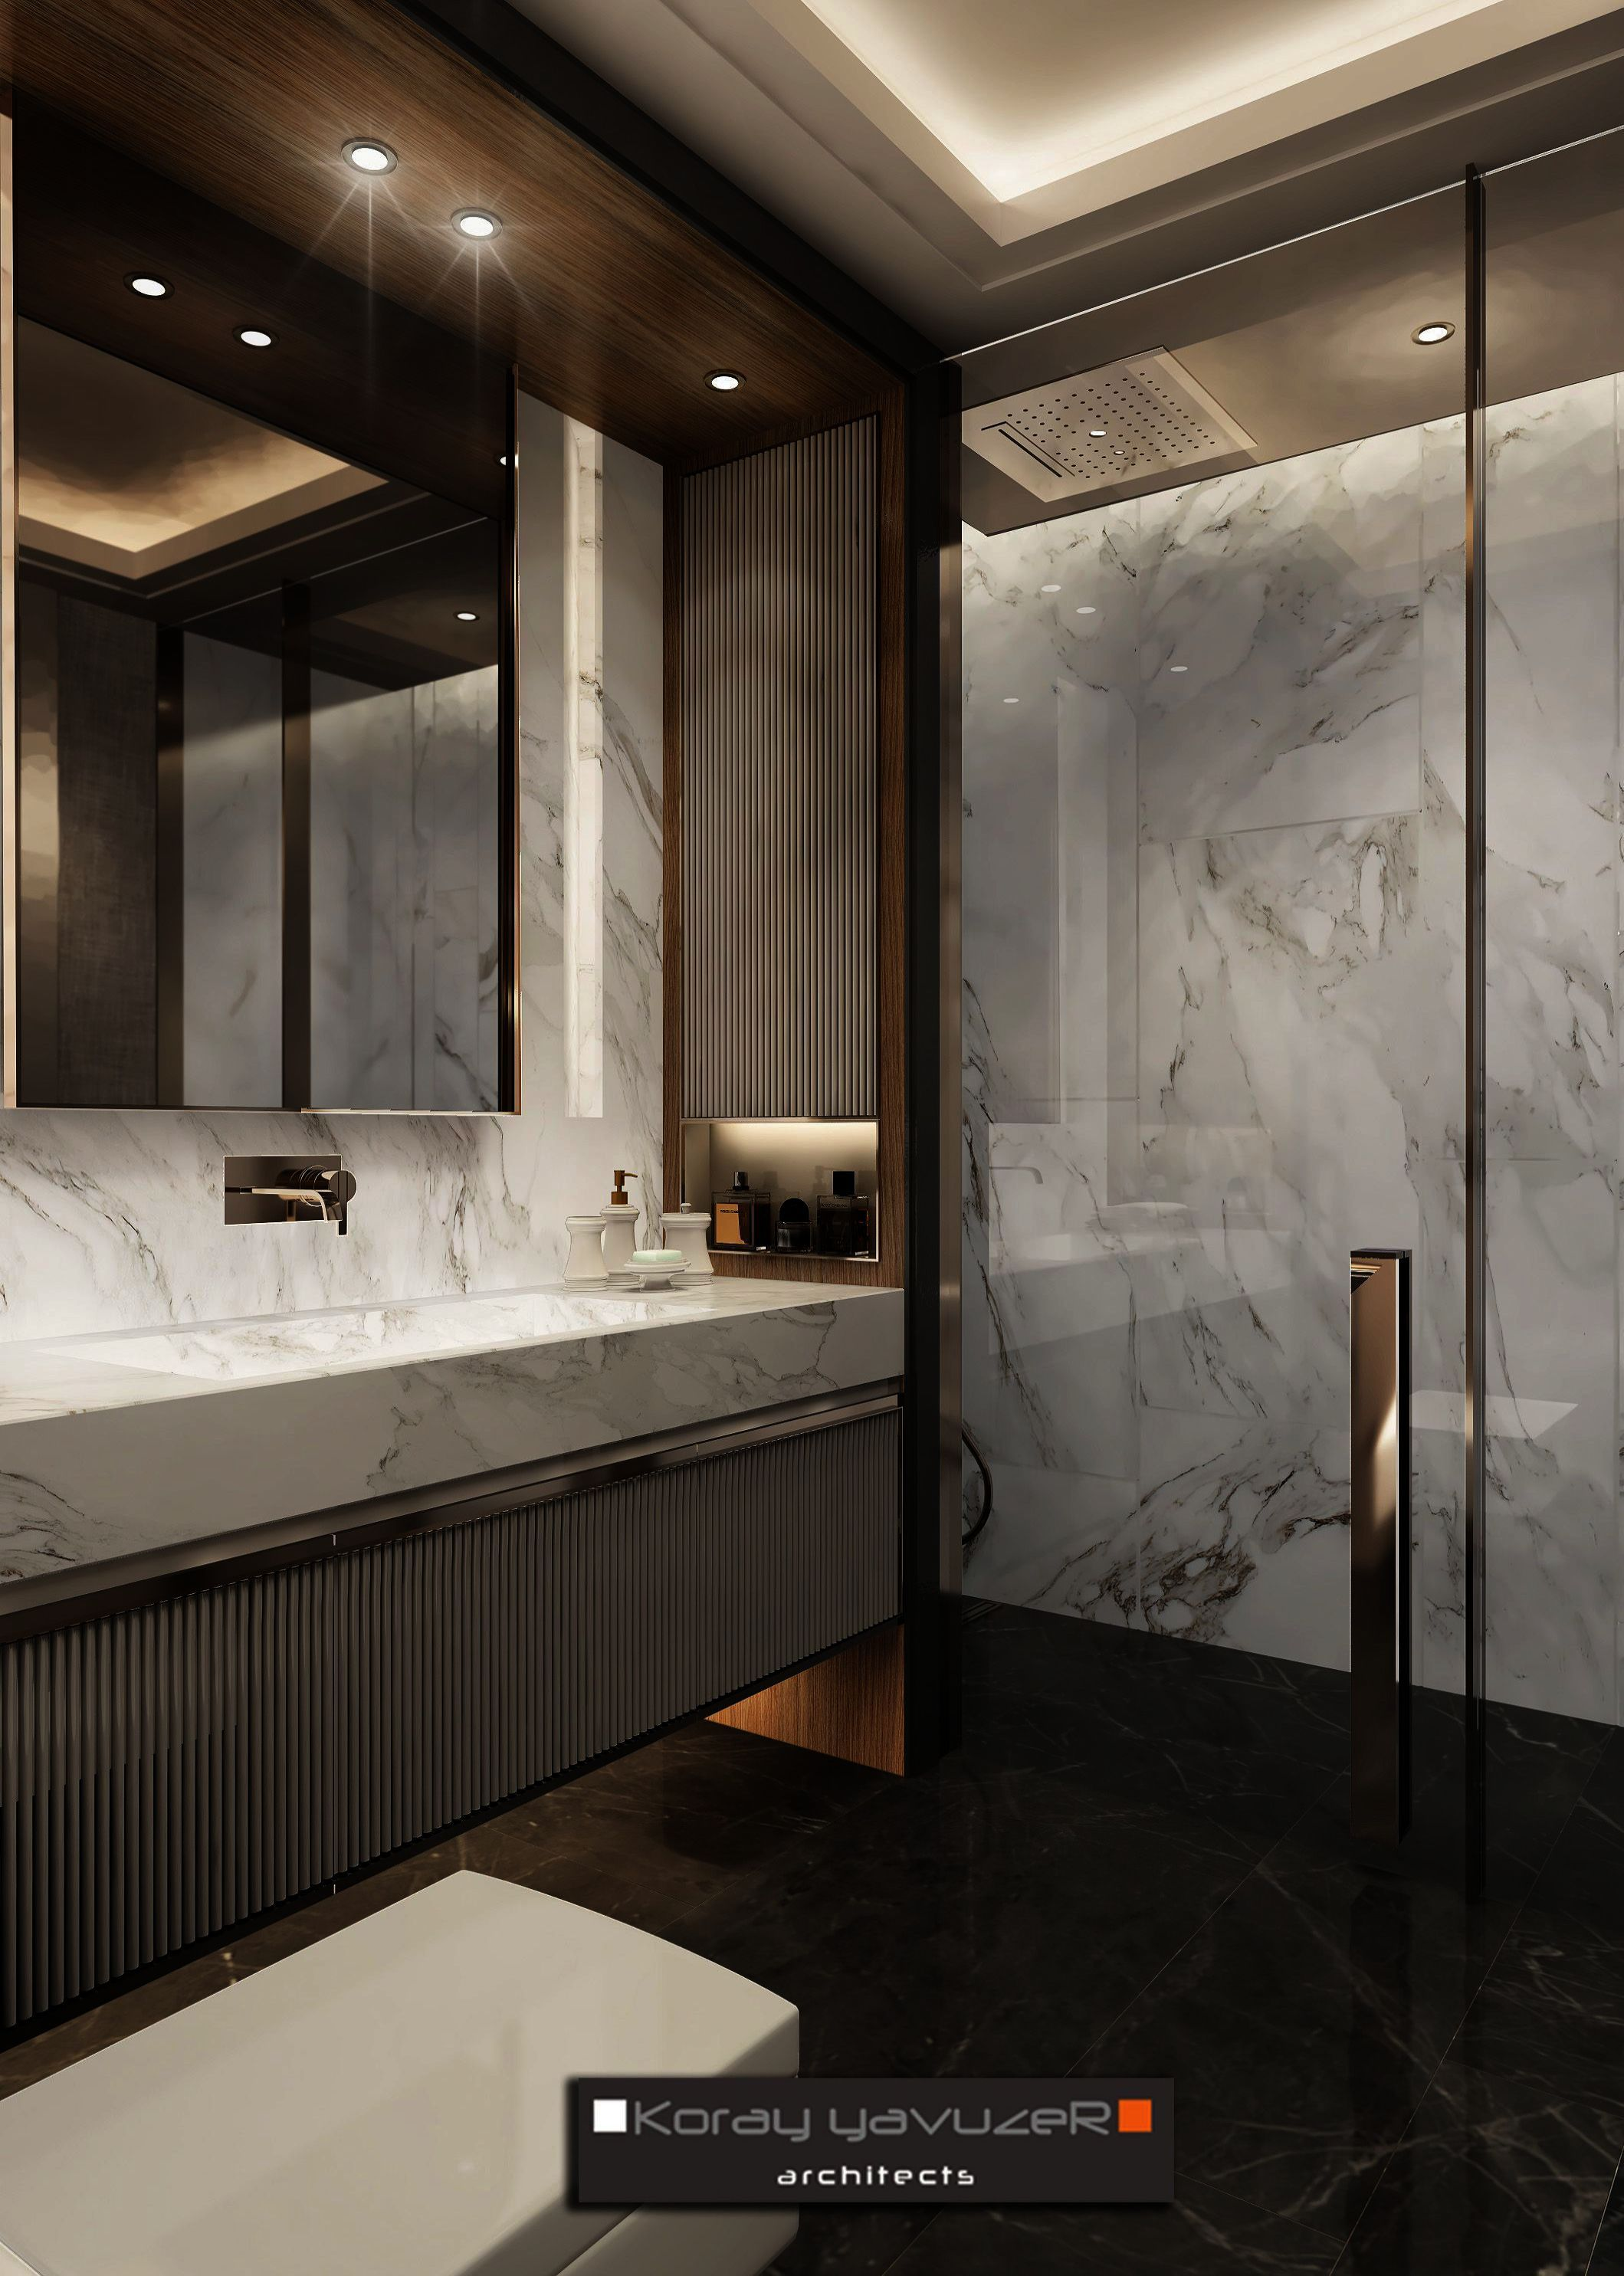 Bathroom Faucets For Sinks Nor Bathroom Light Fixtures Next Half Bathroom Remodel Greensbo Bathroom Decor Luxury Bathroom Design Luxury Latest Bathroom Designs